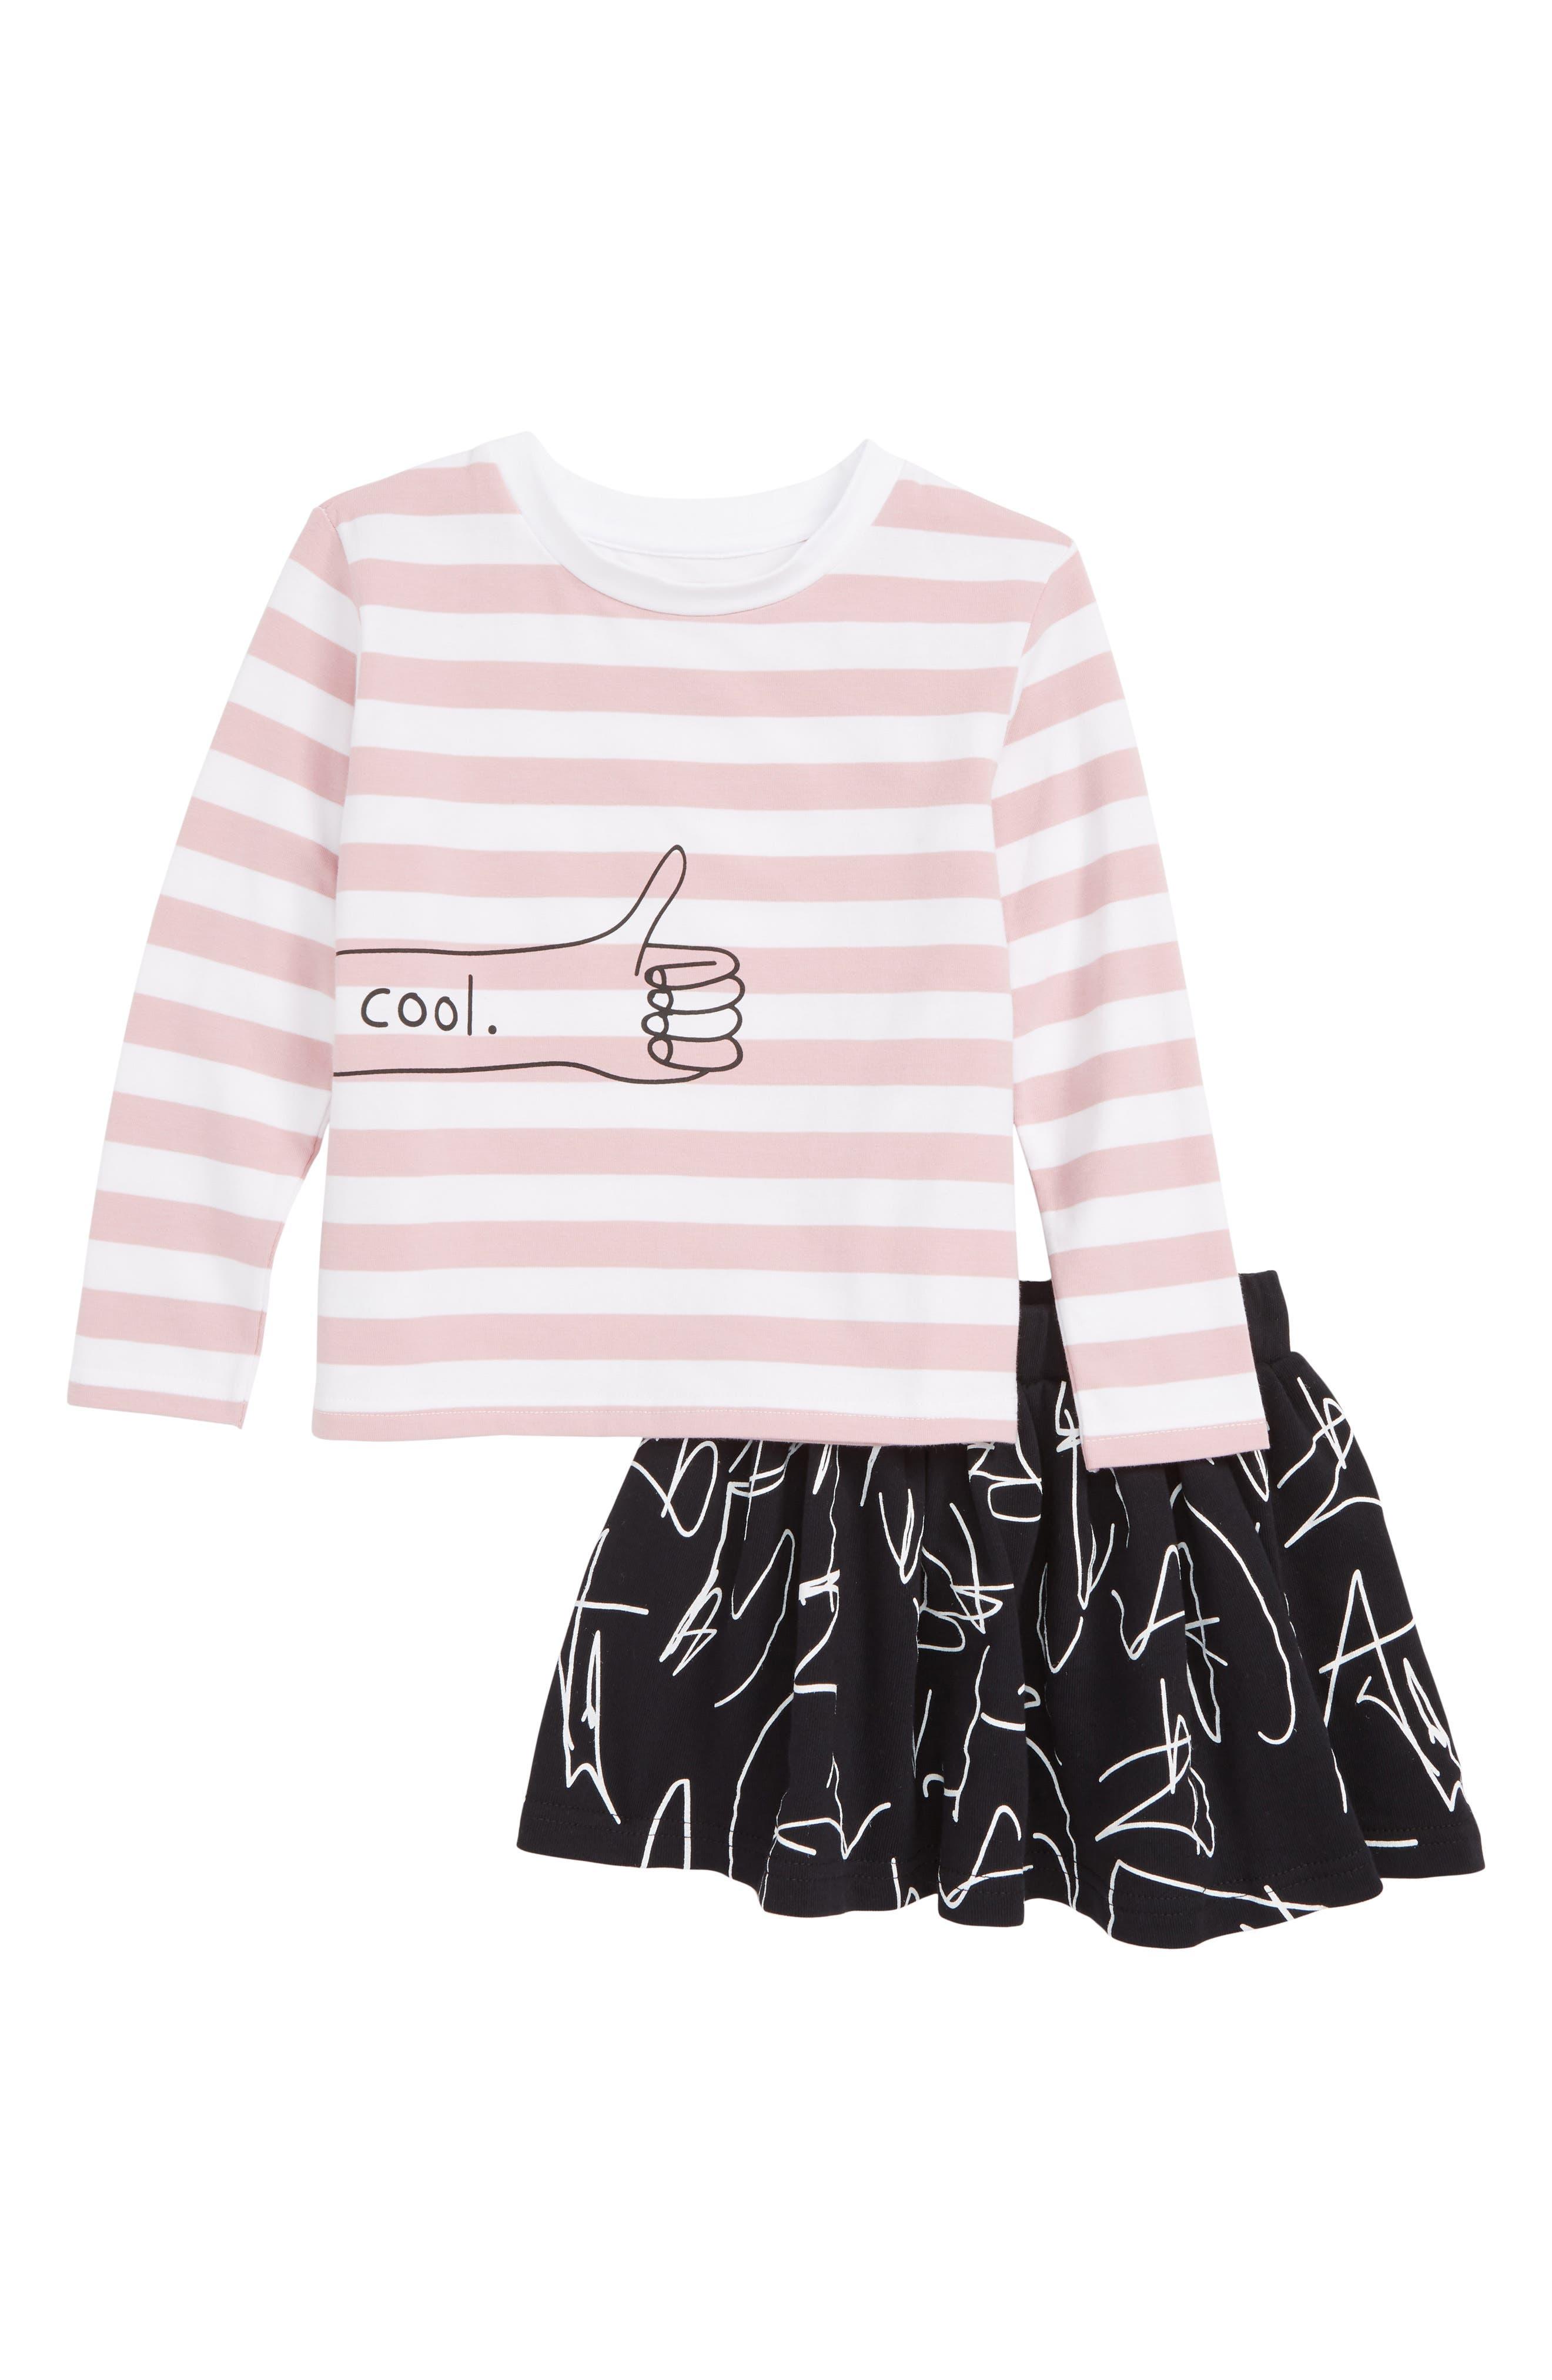 Toddler Girls Tiny Tribe Cool Graphic Tee  Skirt Set